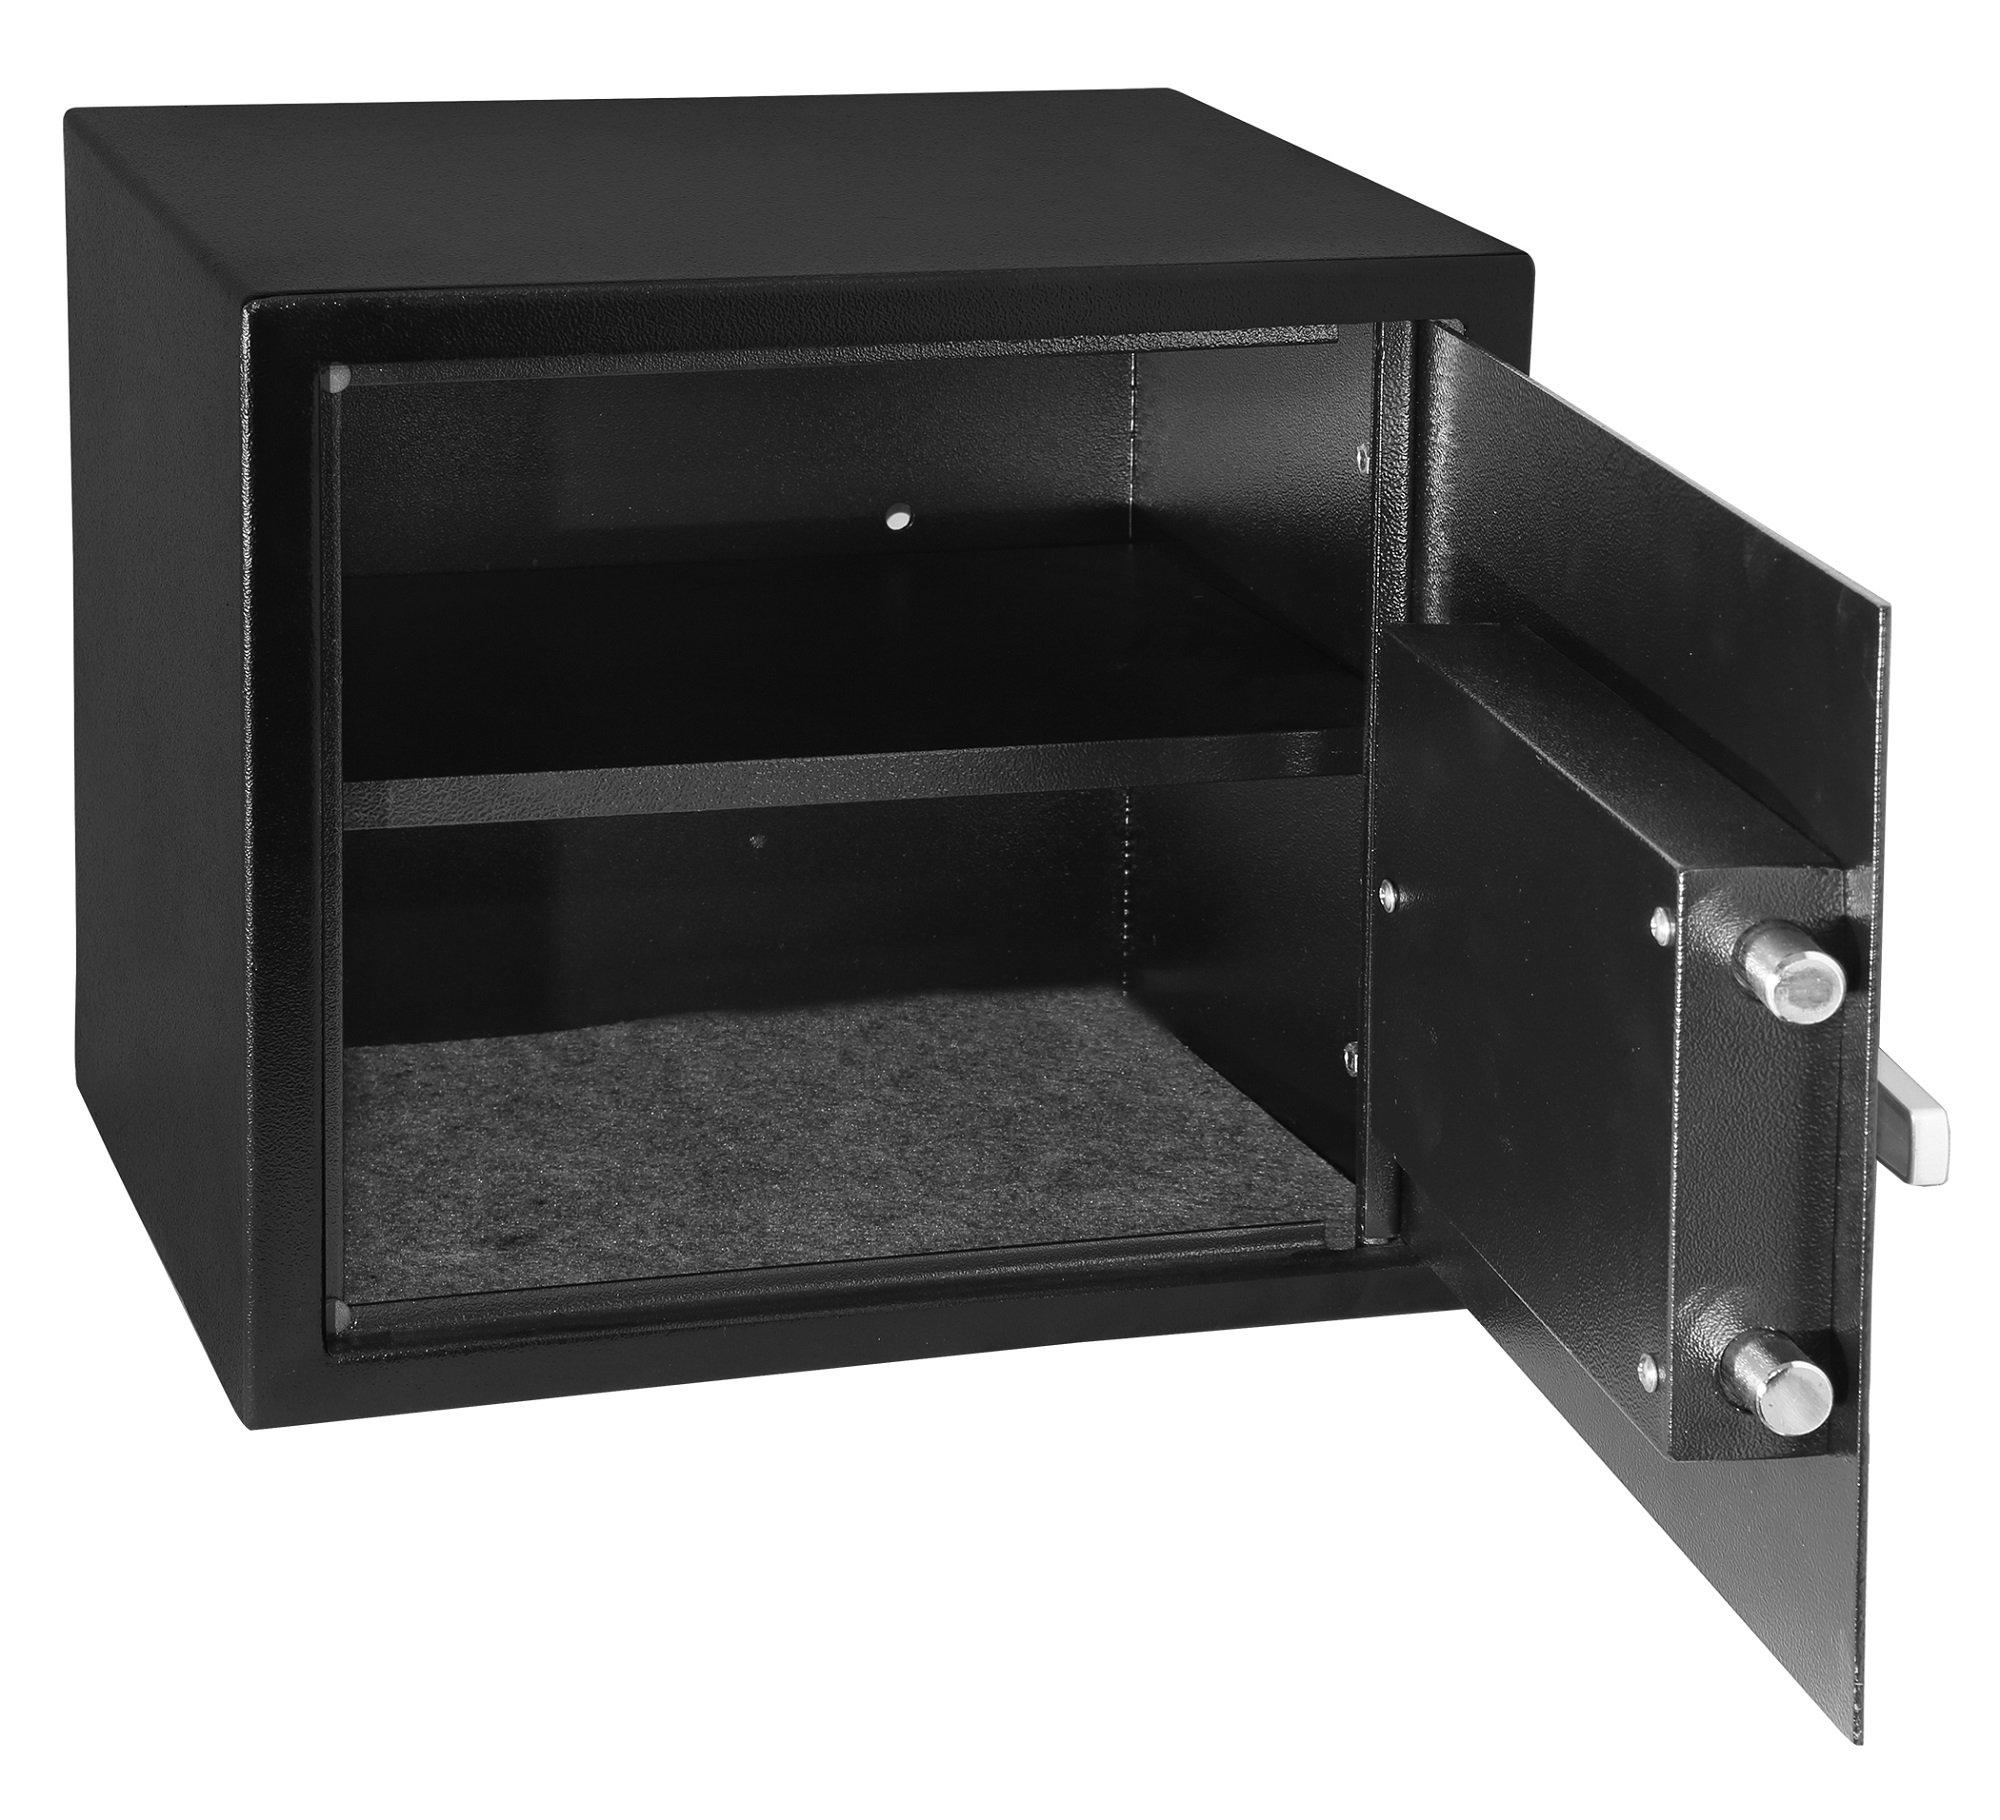 Honeywell Safes & Door Locks 814113015819 5123U Combination Dial Steel Security Safe, 16 x 12.8 x 14 inches, Black